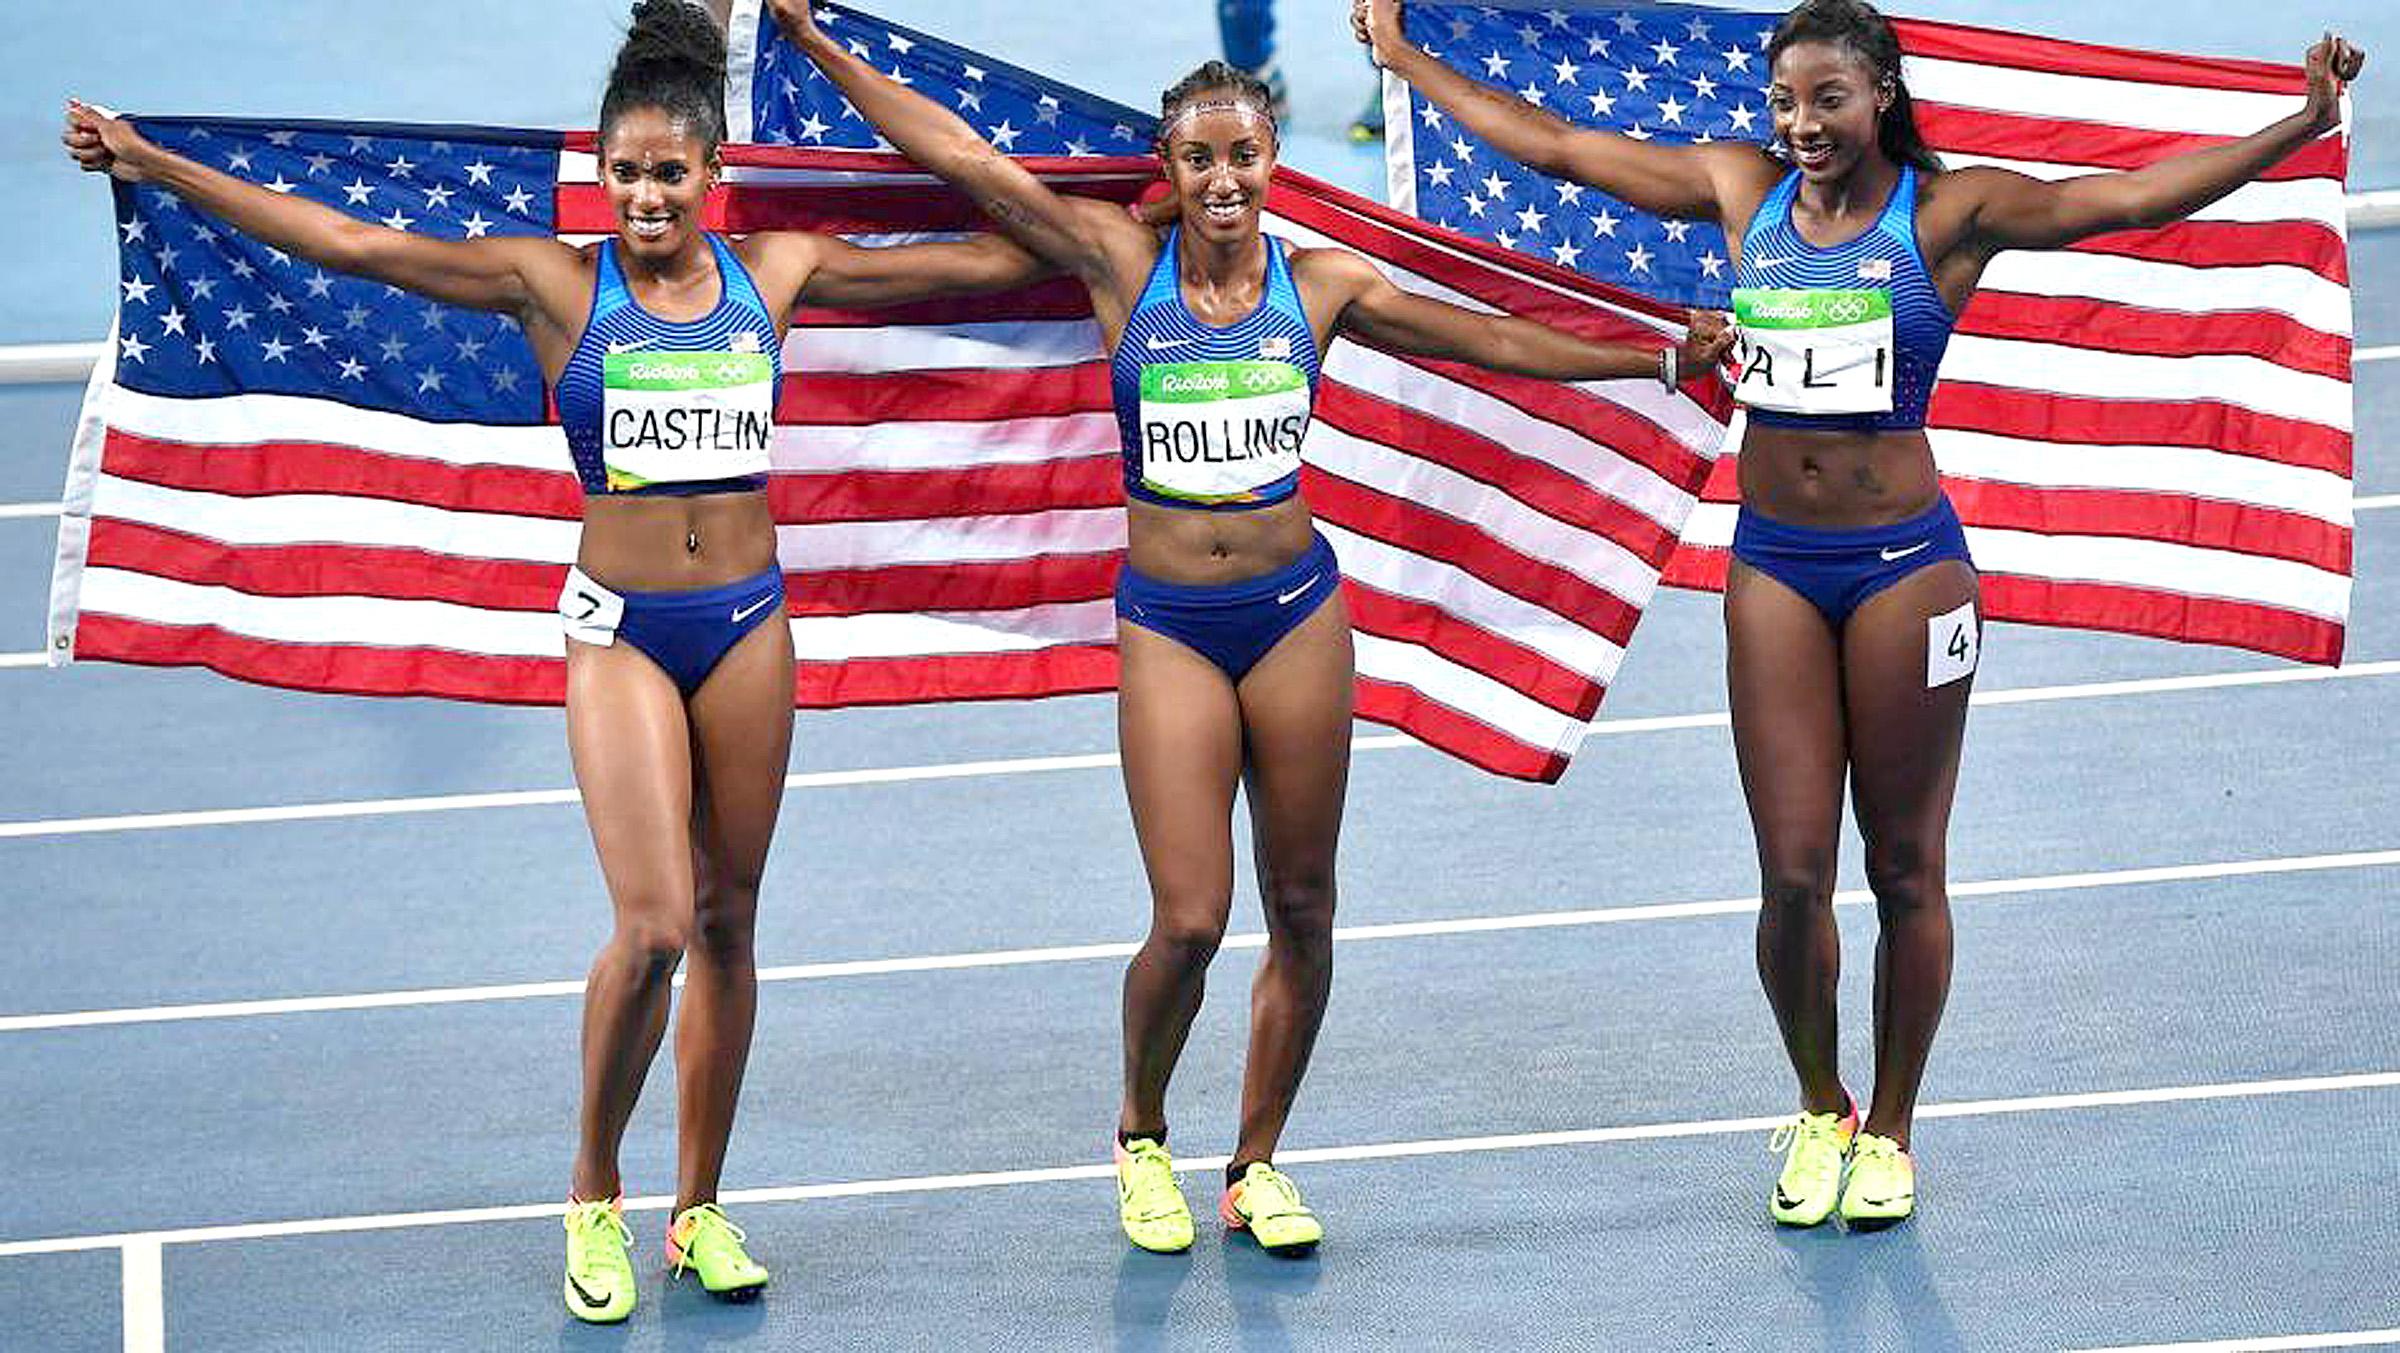 Team USA Sweeps 100m Hurdles Medals